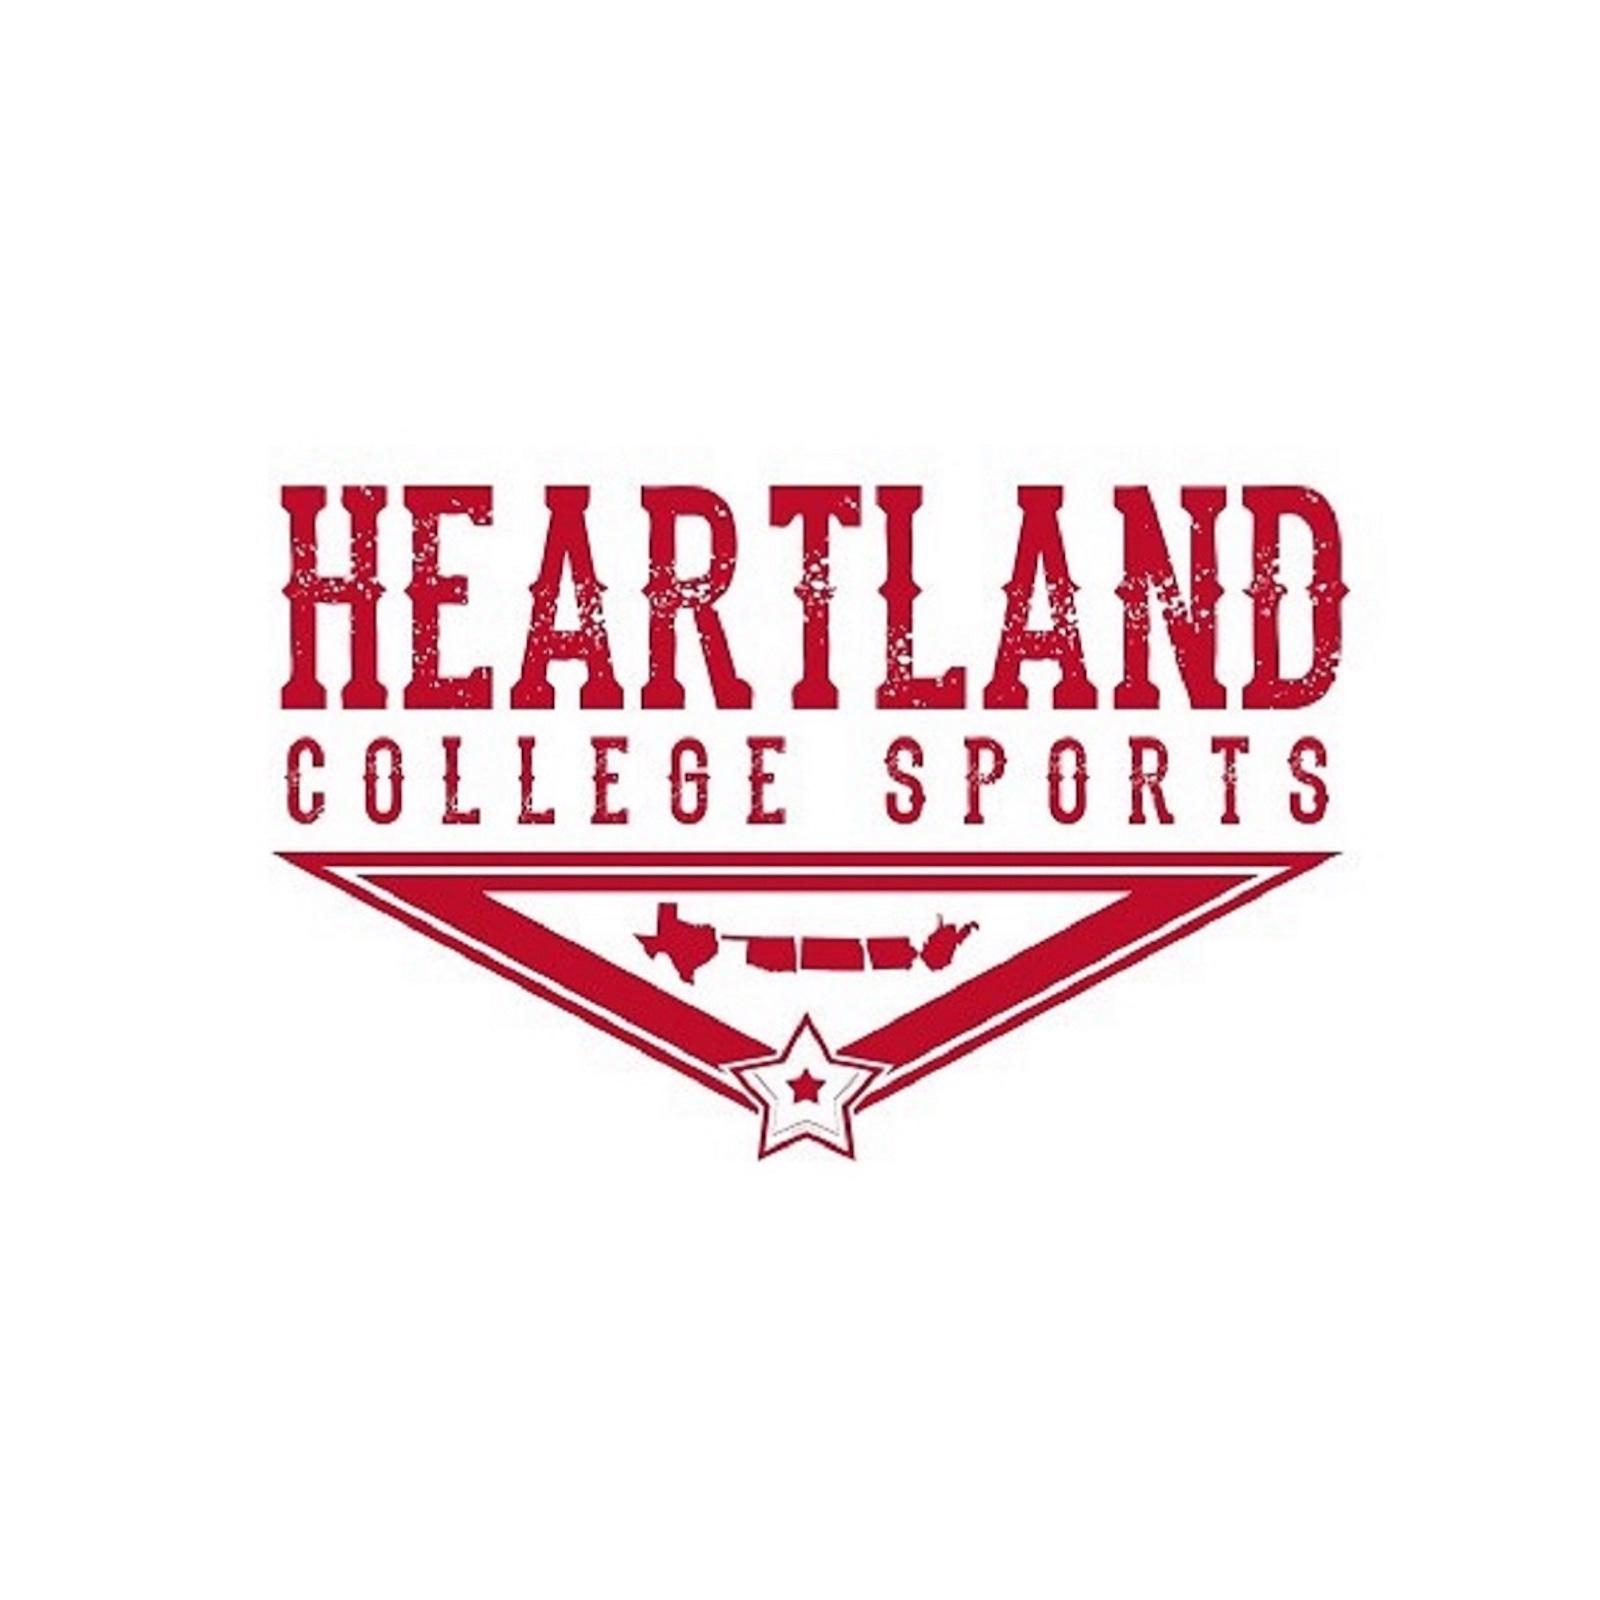 Heartland College Sports: Big 12 College Football Podcast show art